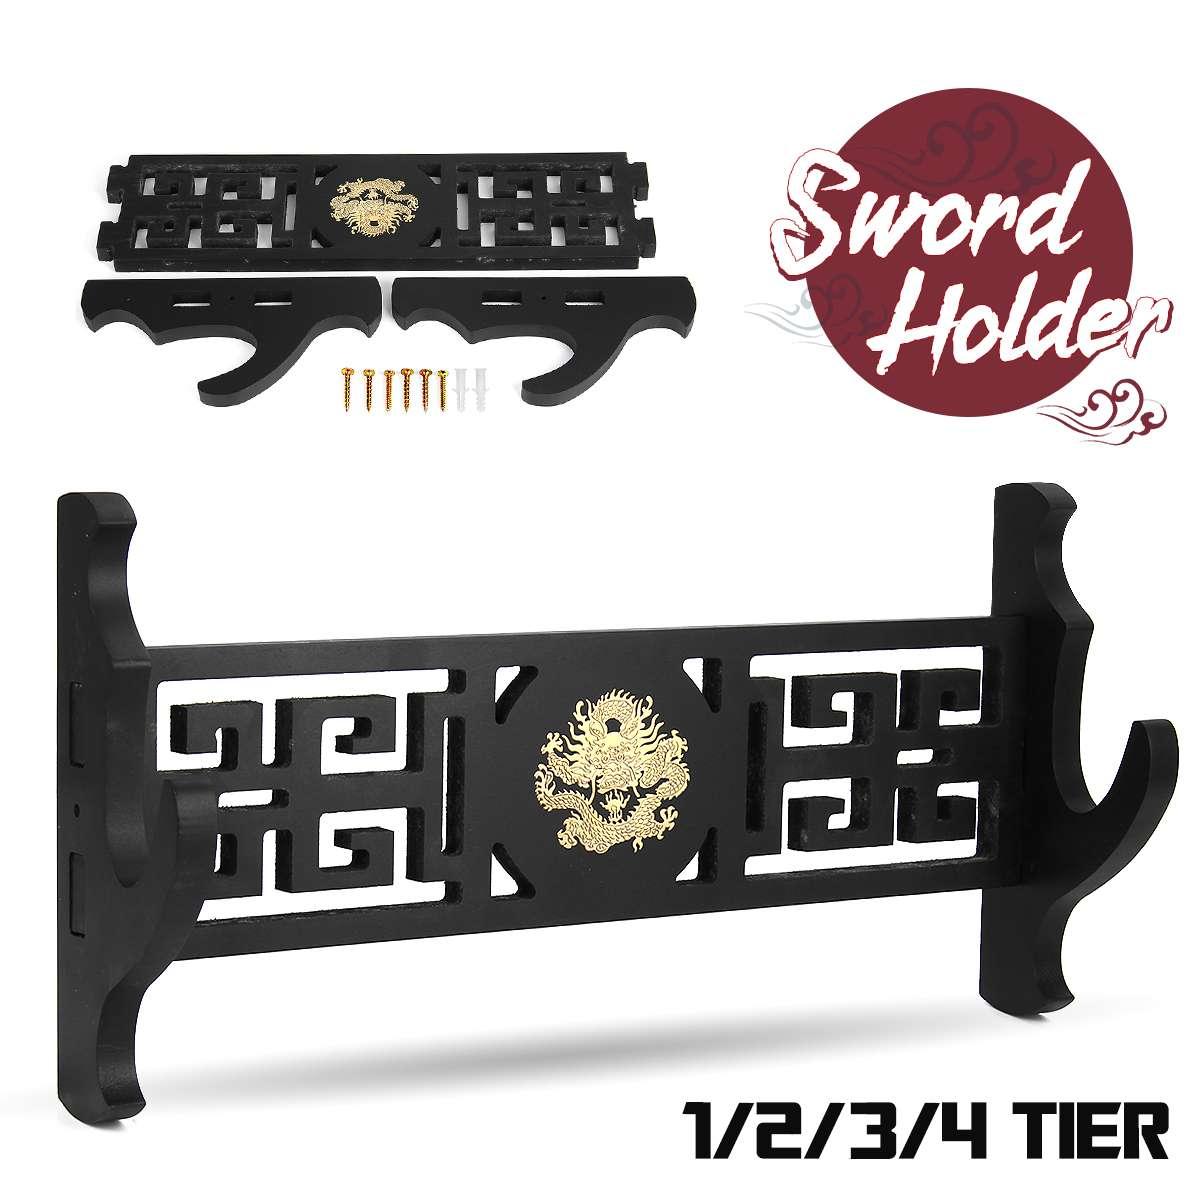 Dragon Wall Mount Hanger Sword Holder Display Stand Katana Hollowed Out Samurai